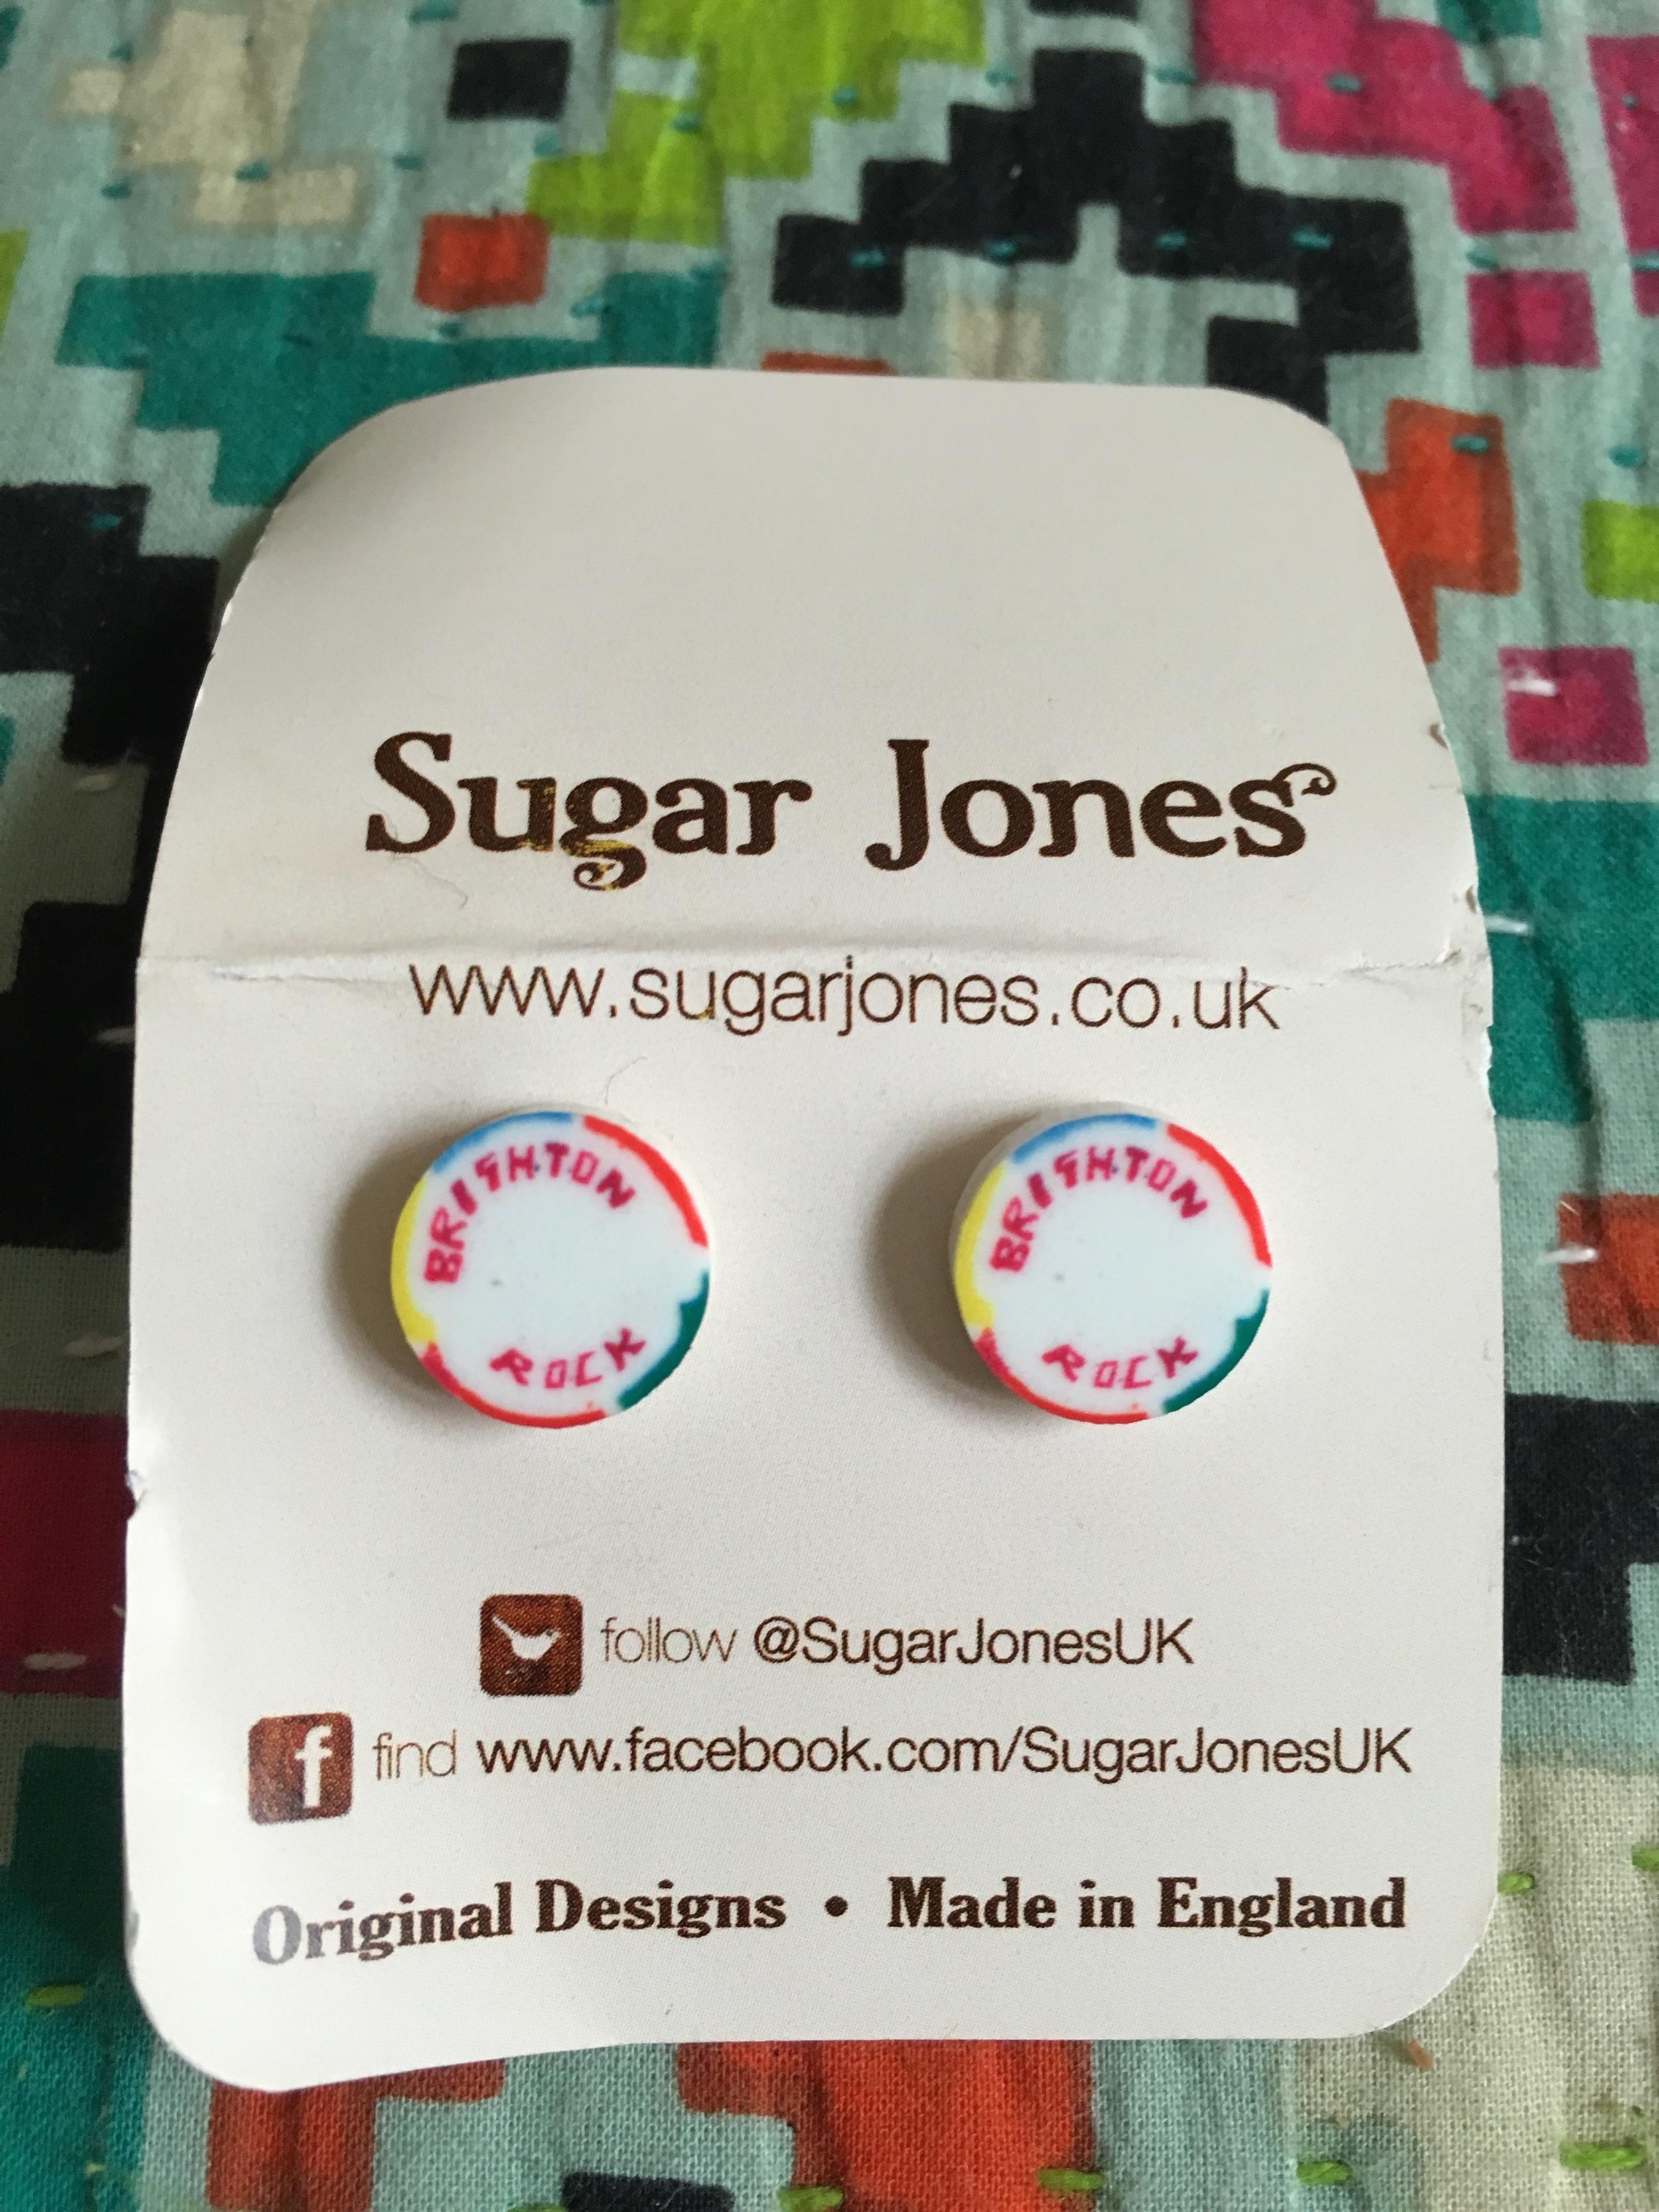 Day 14 & Brighton Rock earrings from Sugar Jones